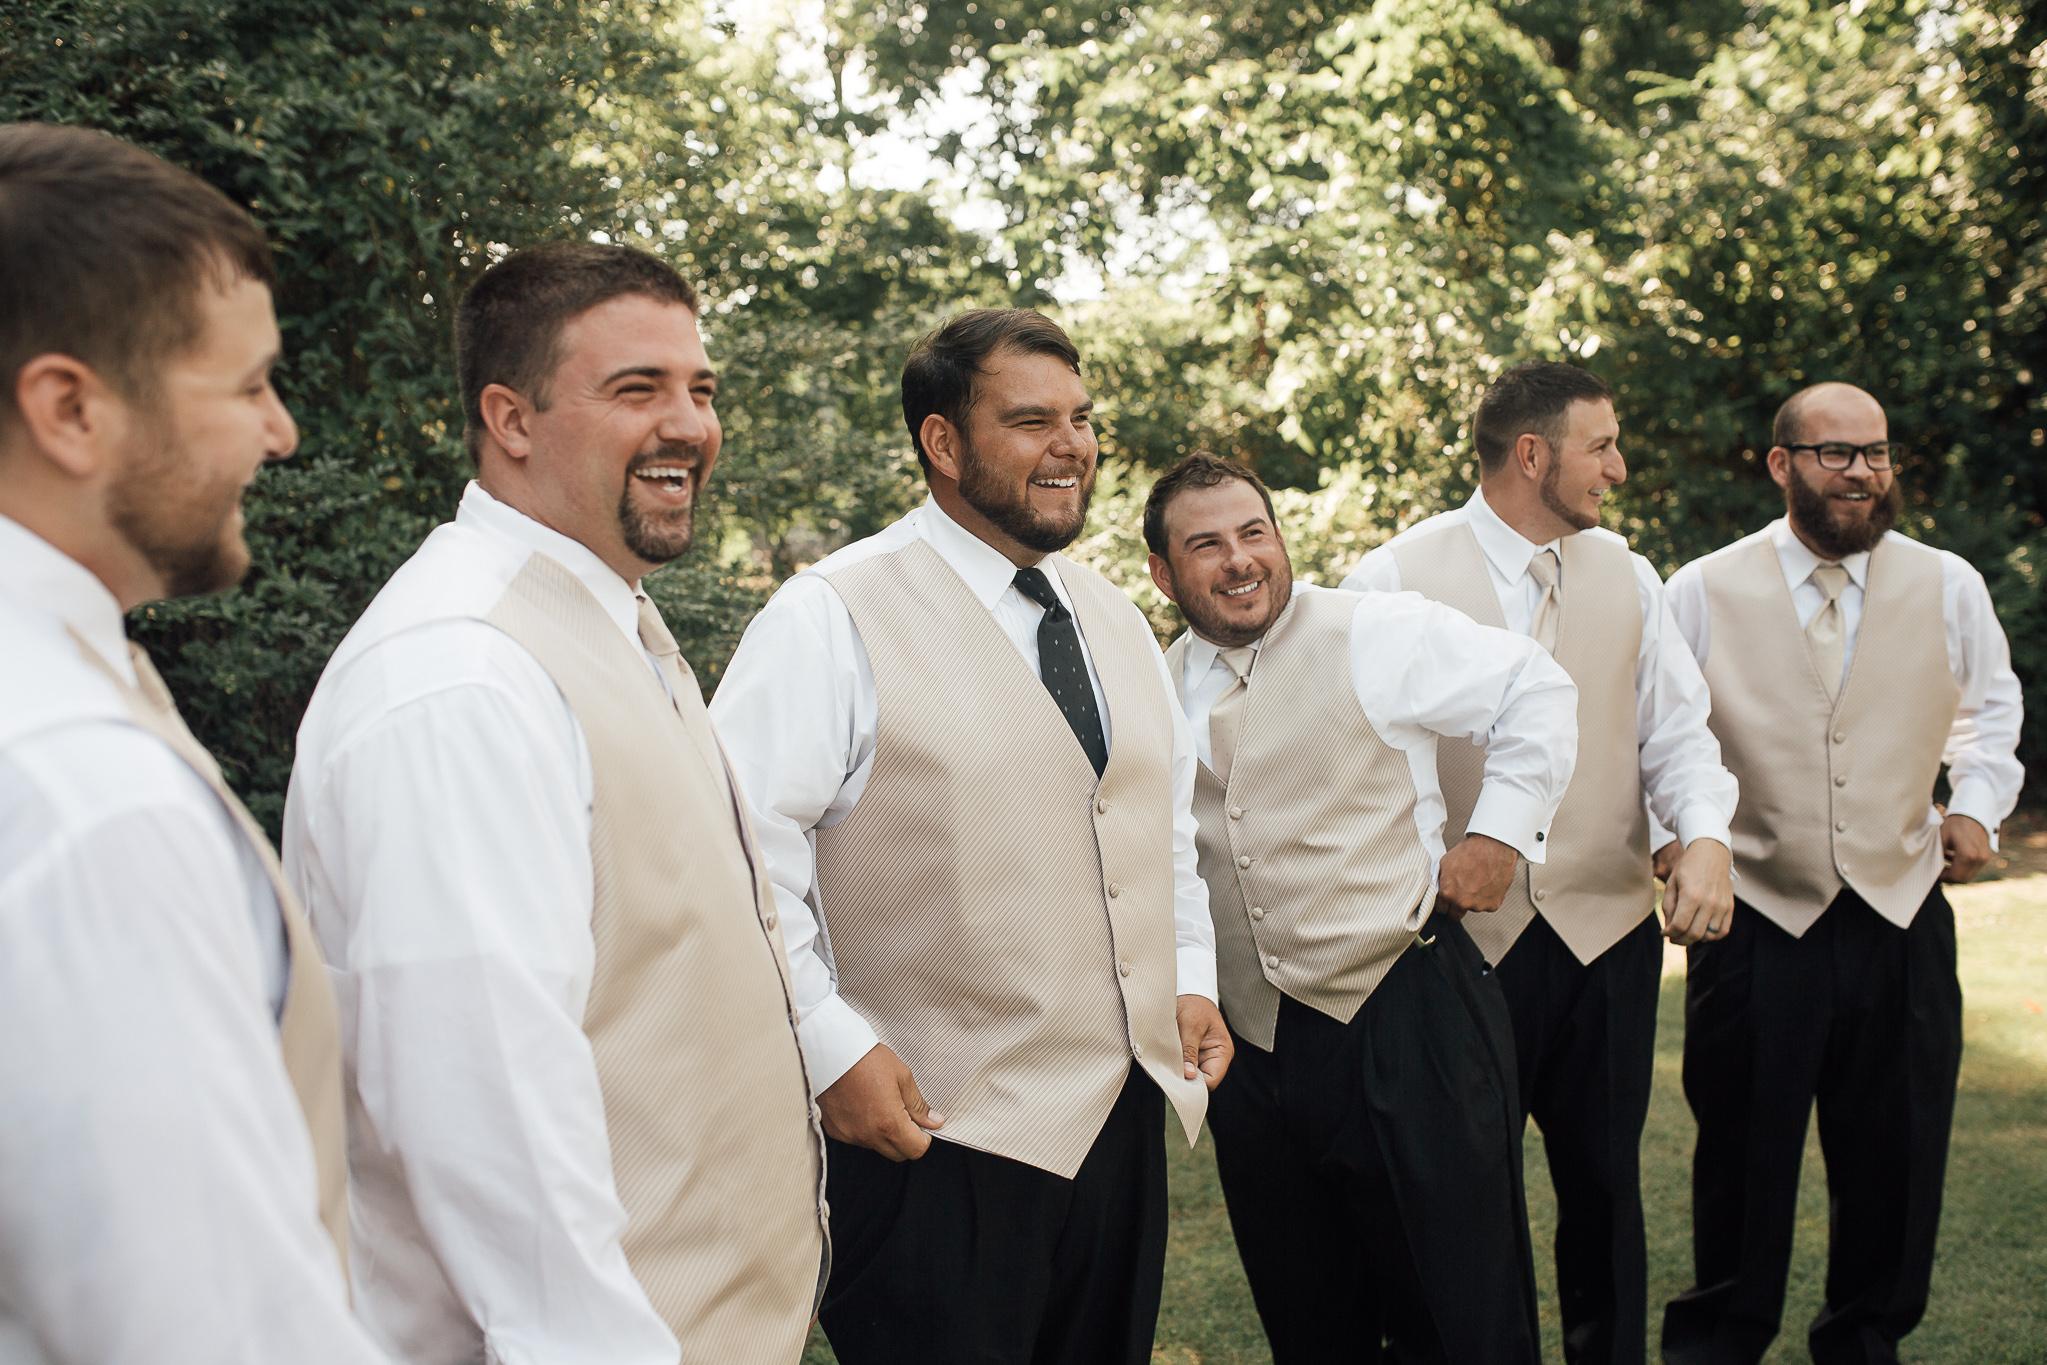 cassie-cook-photography-memphis-wedding-photographer-fountain-south-inn-groom-groomsmen